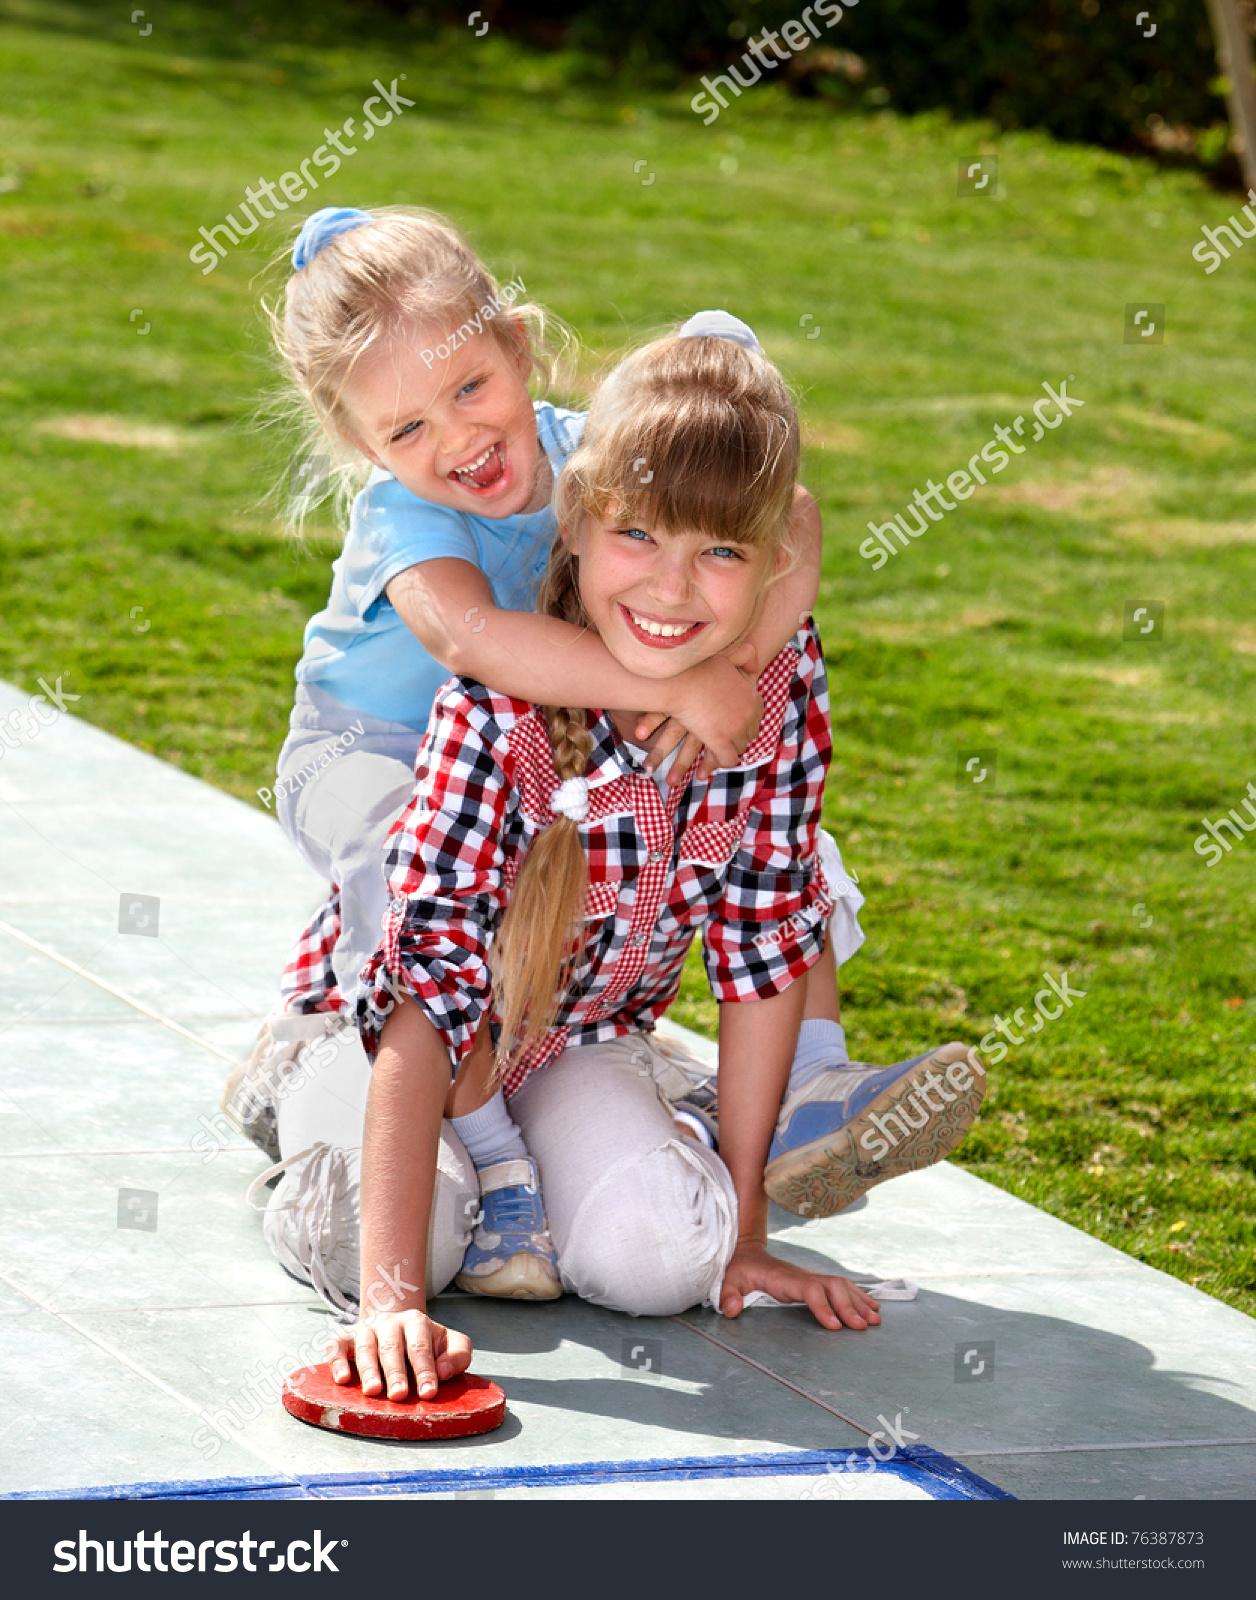 Children Playing Park Kids Outdoor Games Stock